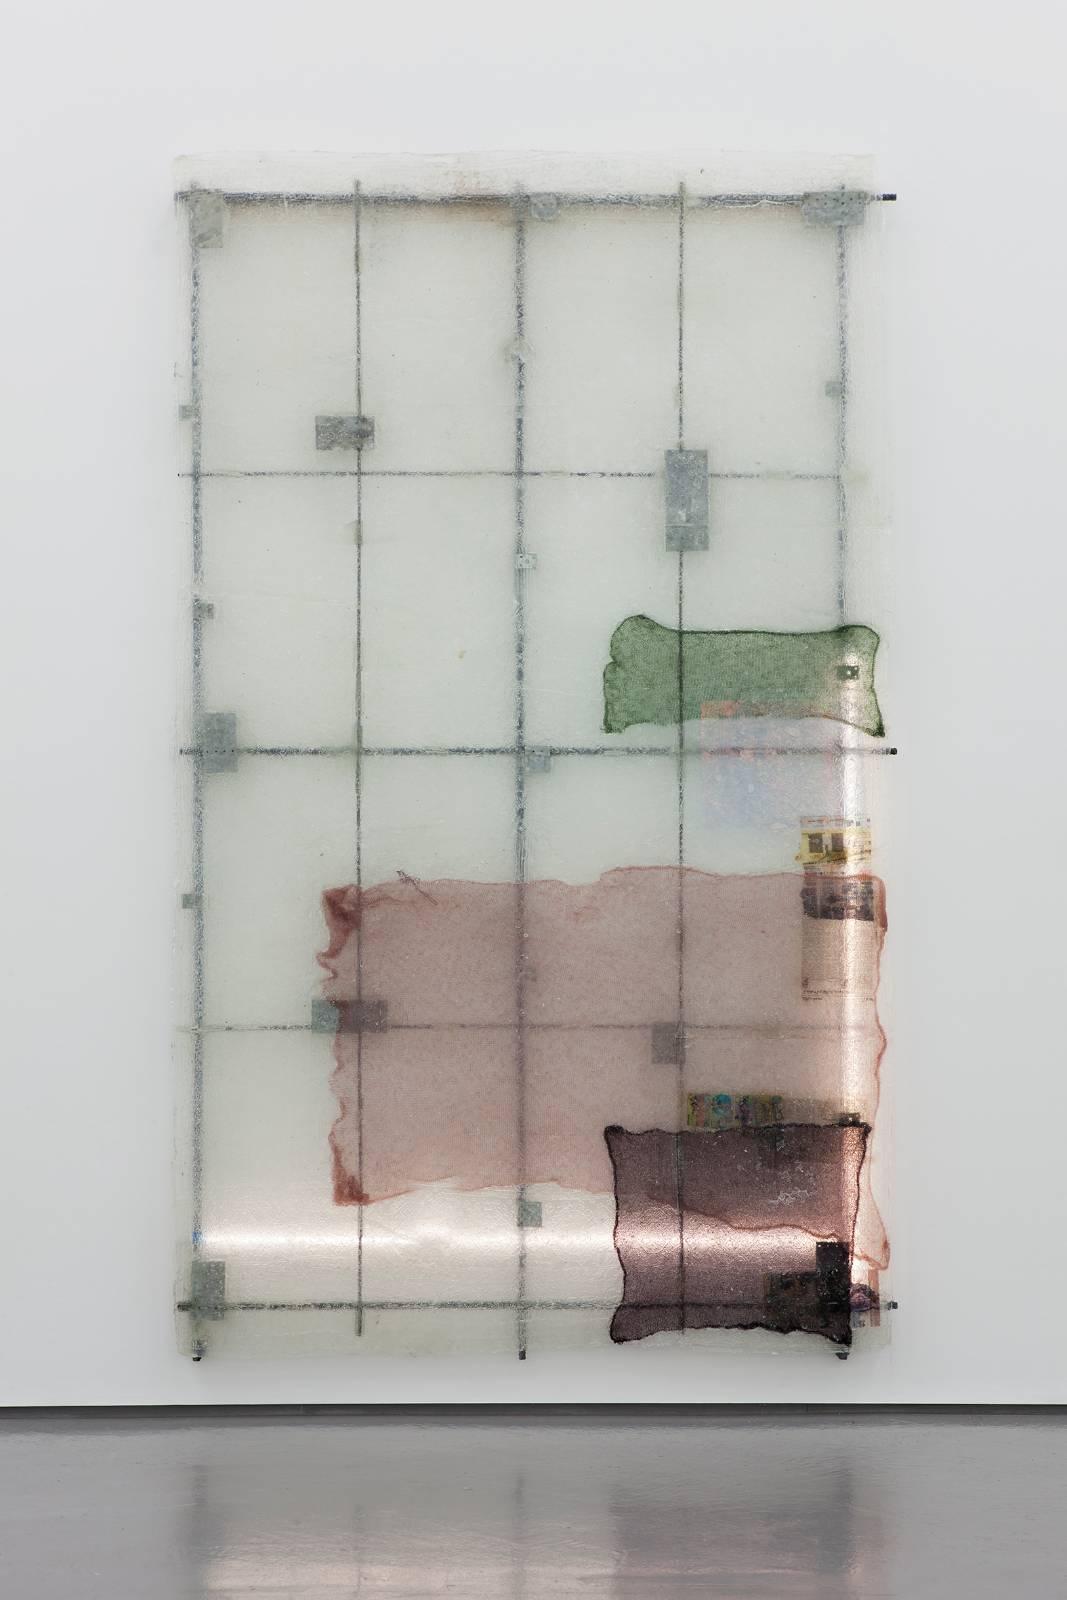 Freud's Gashgai, 2011/2012, steel, knitting, polyester, paper, neon, 286 x 176 x 7 cm